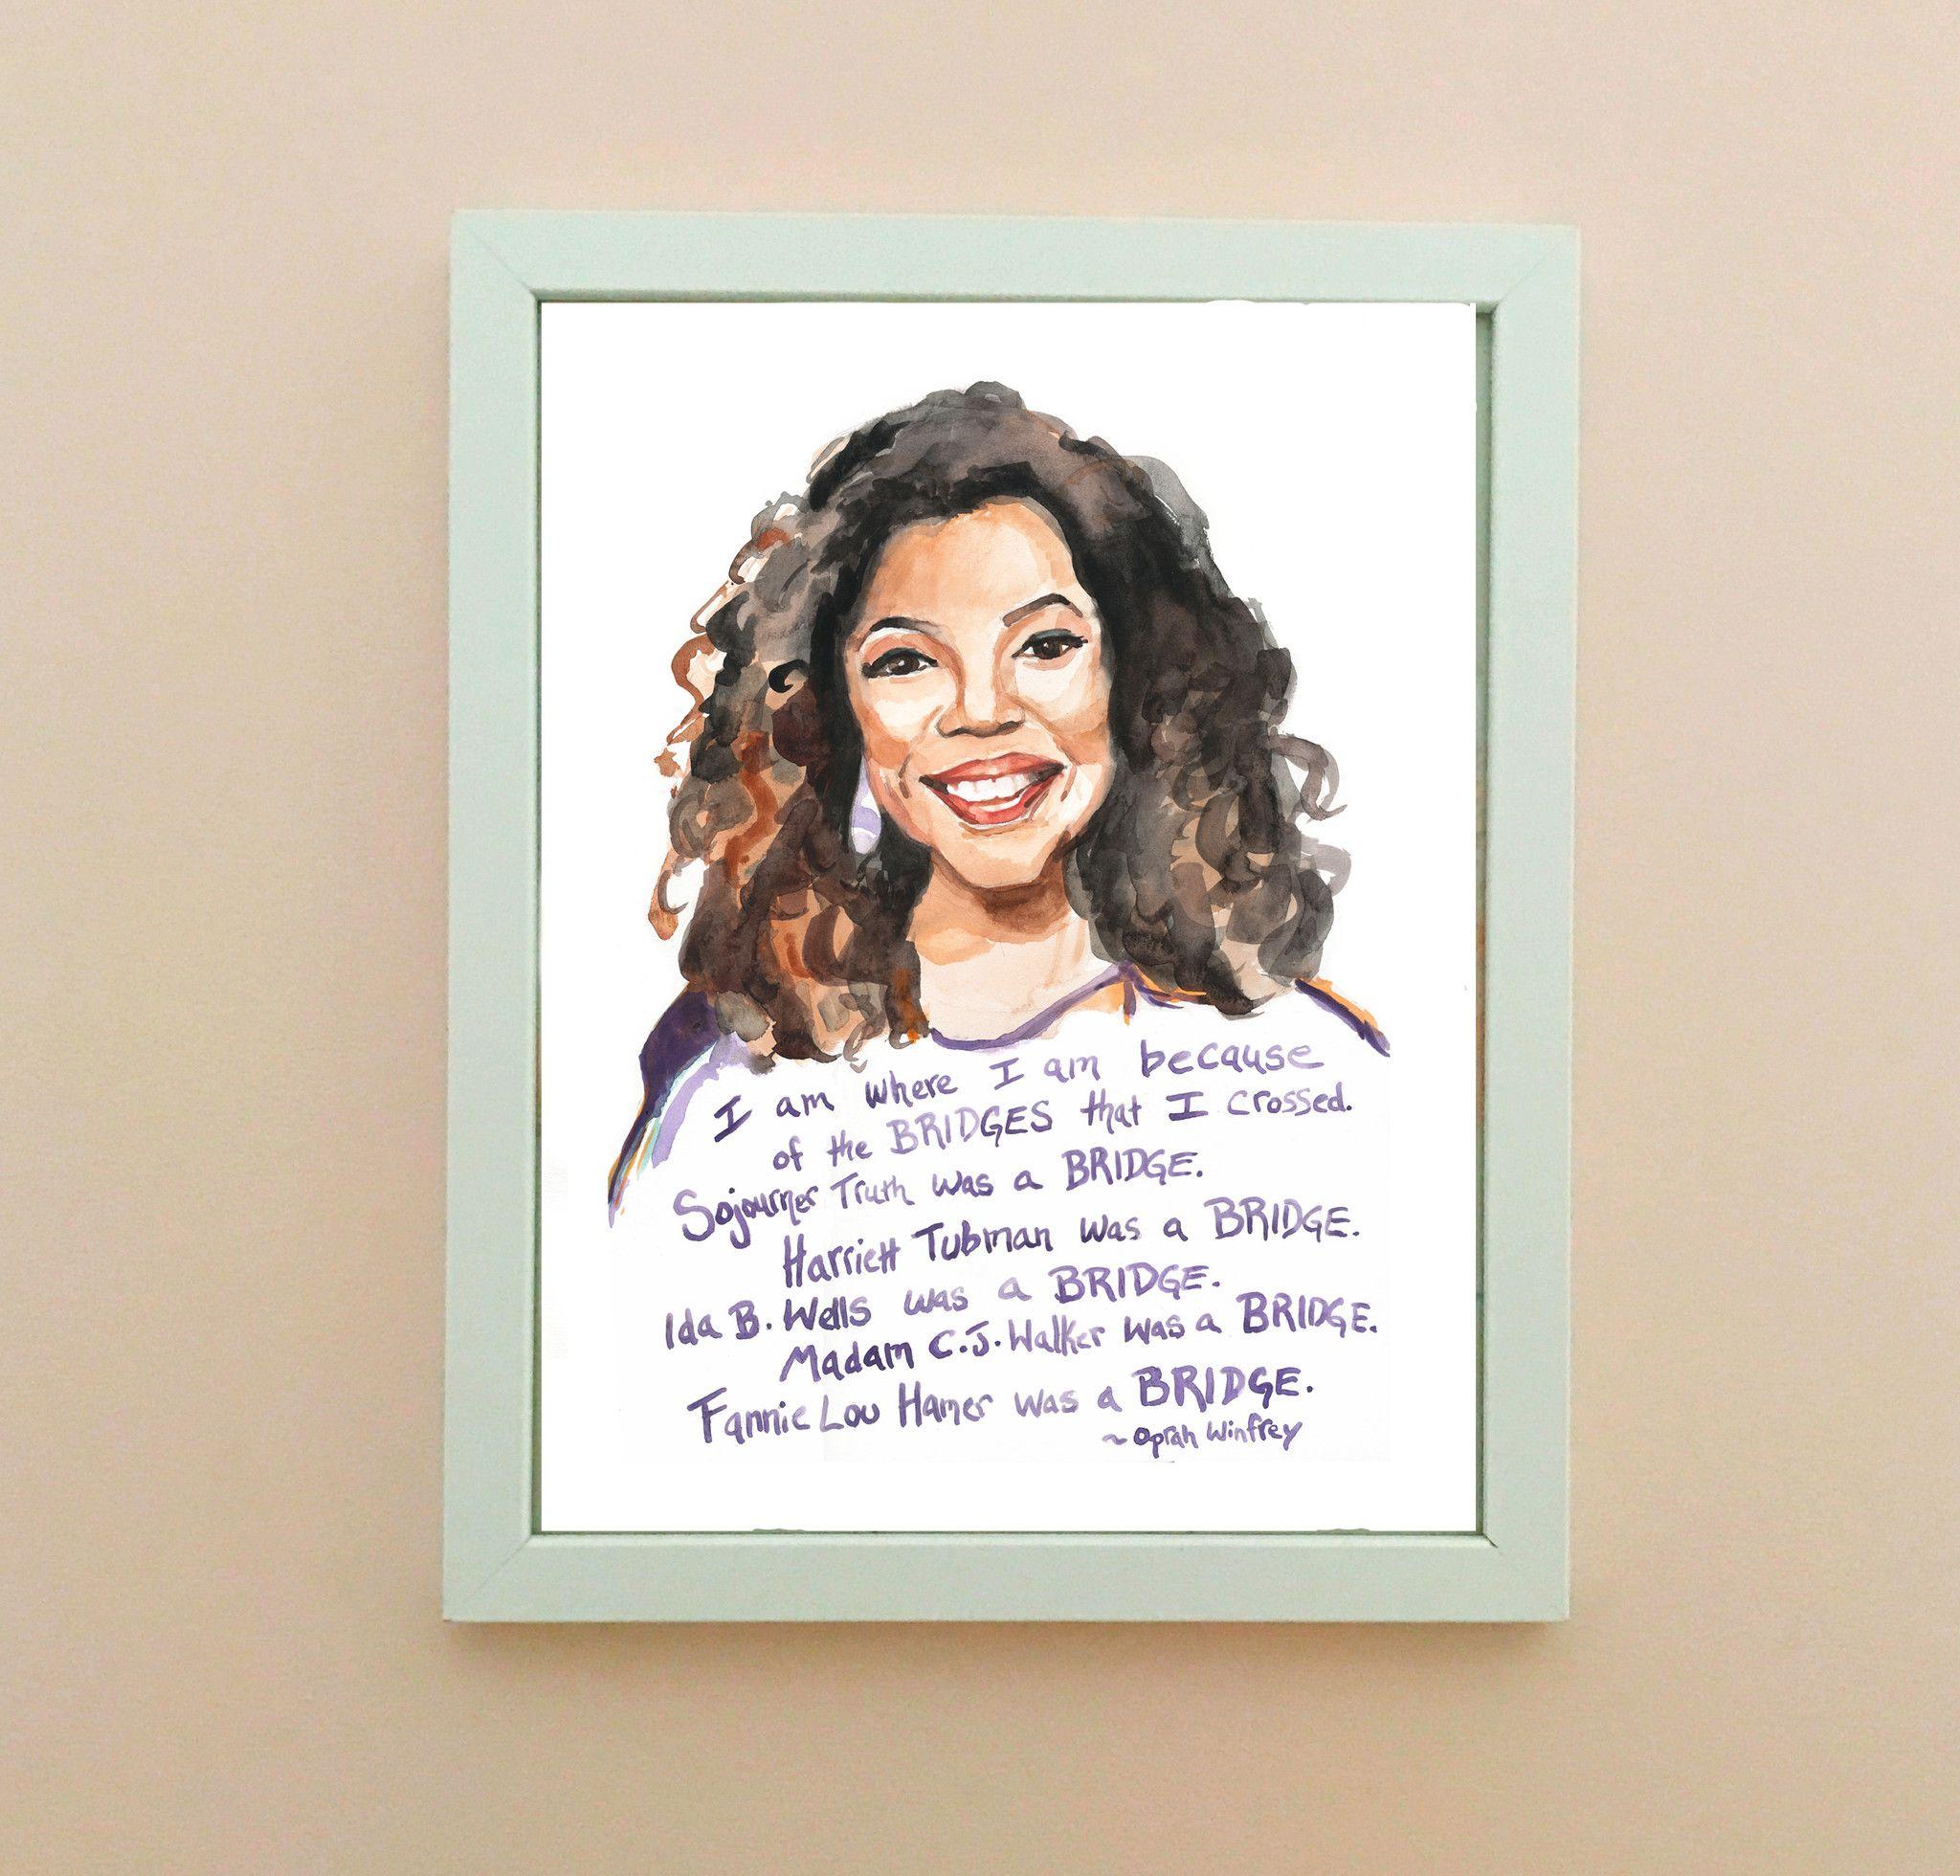 Oprah Winfrey, Portrait And Inspiring Quote